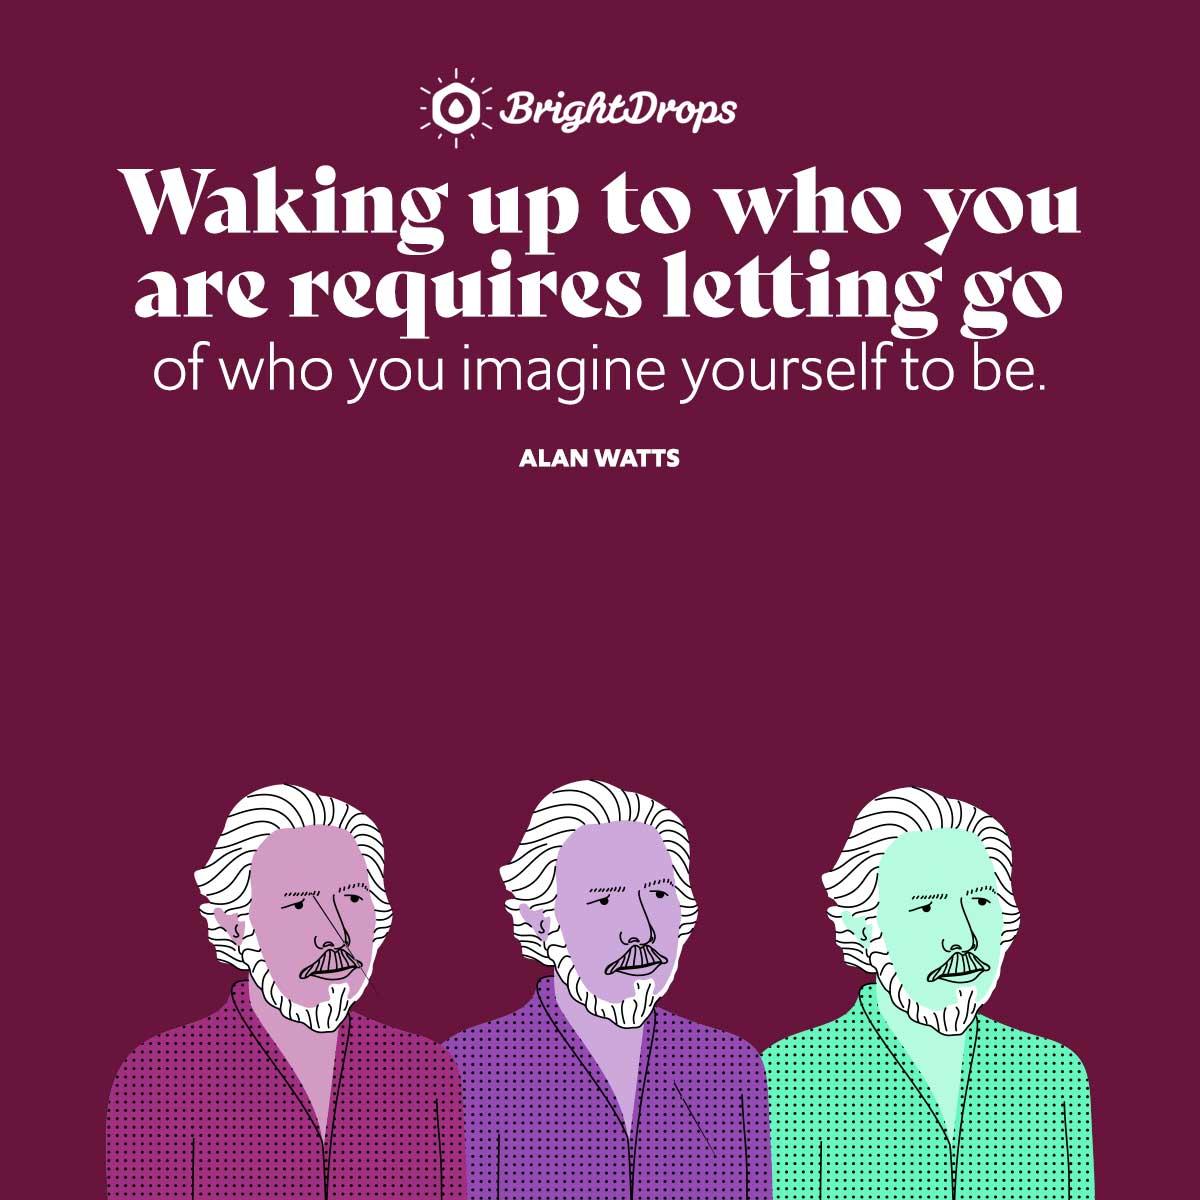 Alan Watts Quotes On Self